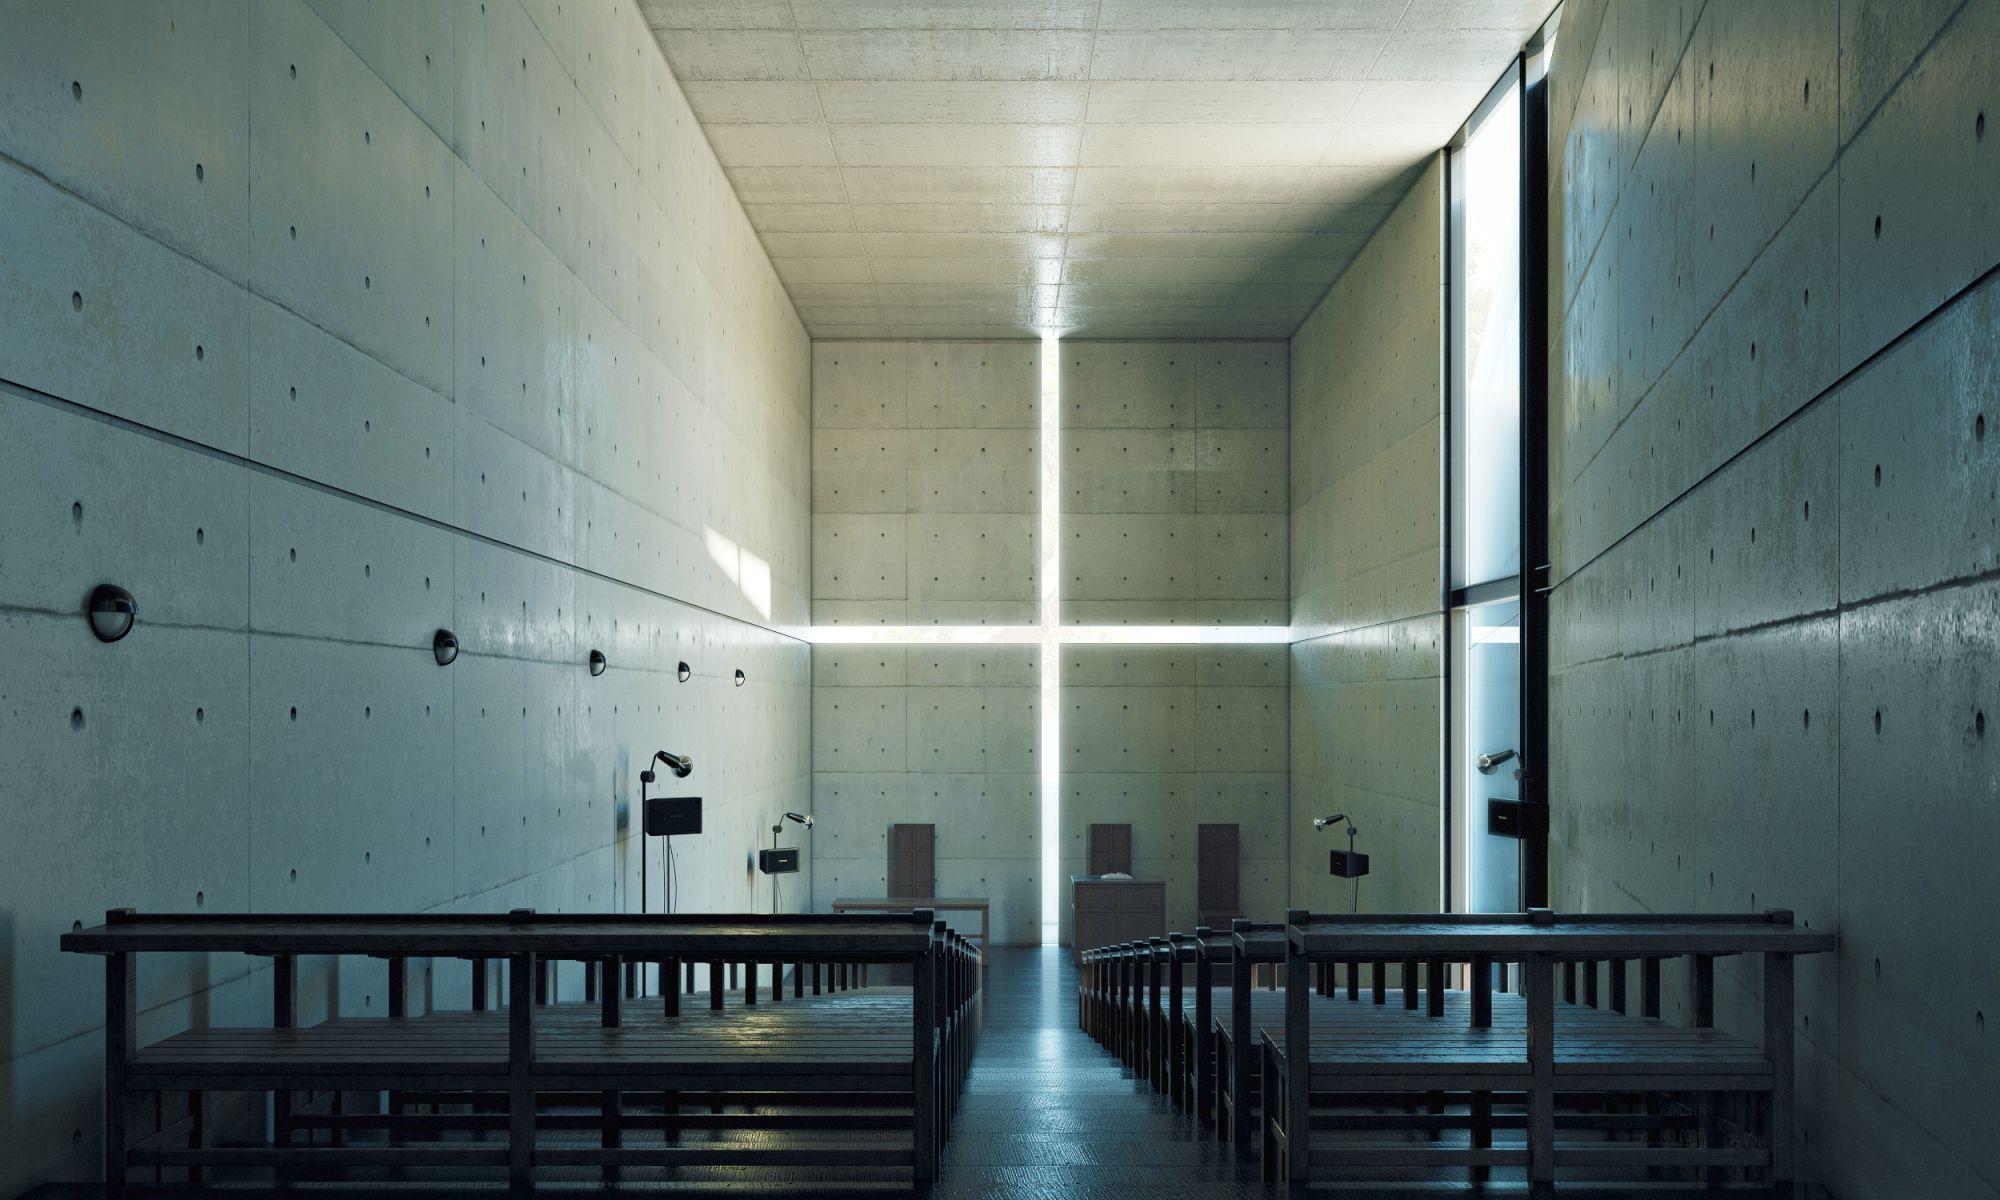 church_of_light_view01_large-1.jpg